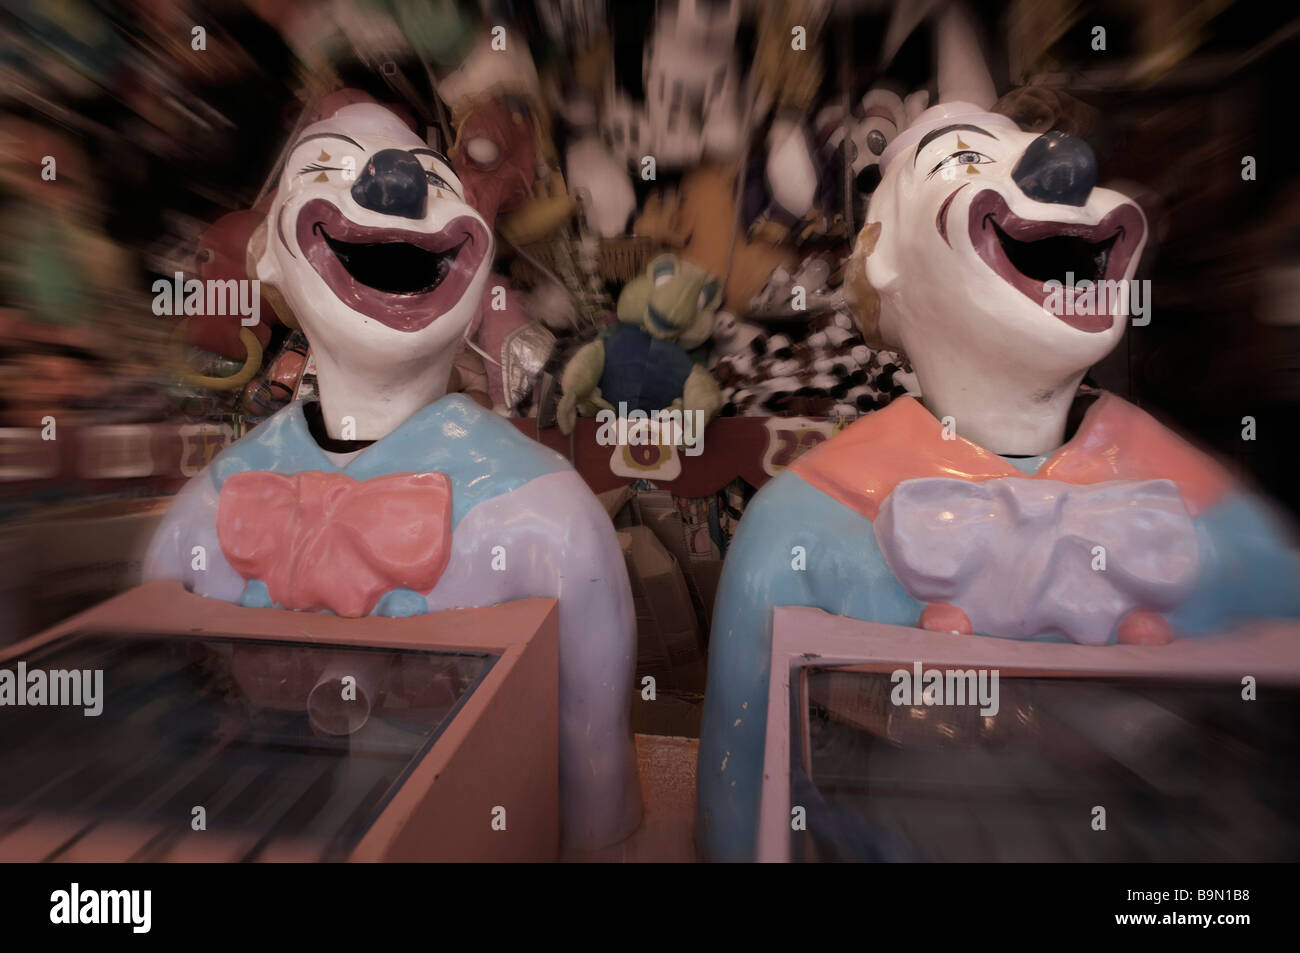 Sideshow clowns - Stock Image